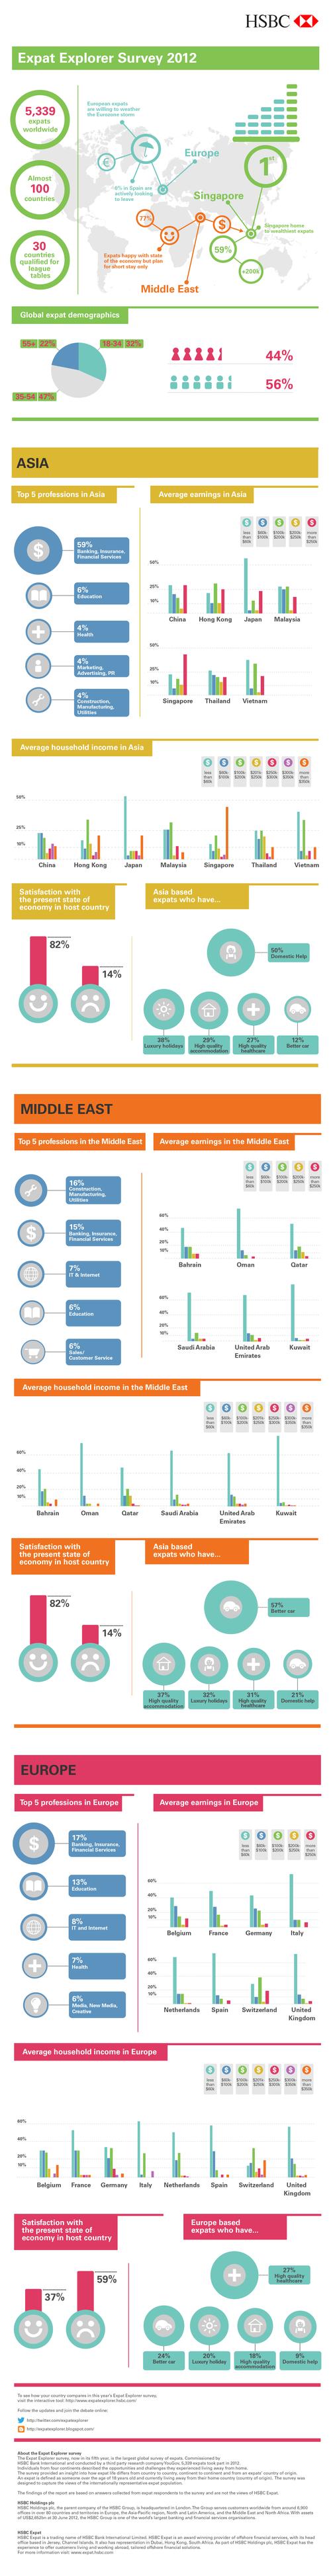 HSBC Expat Launches their New Expat Explorer Survey [Infographic]